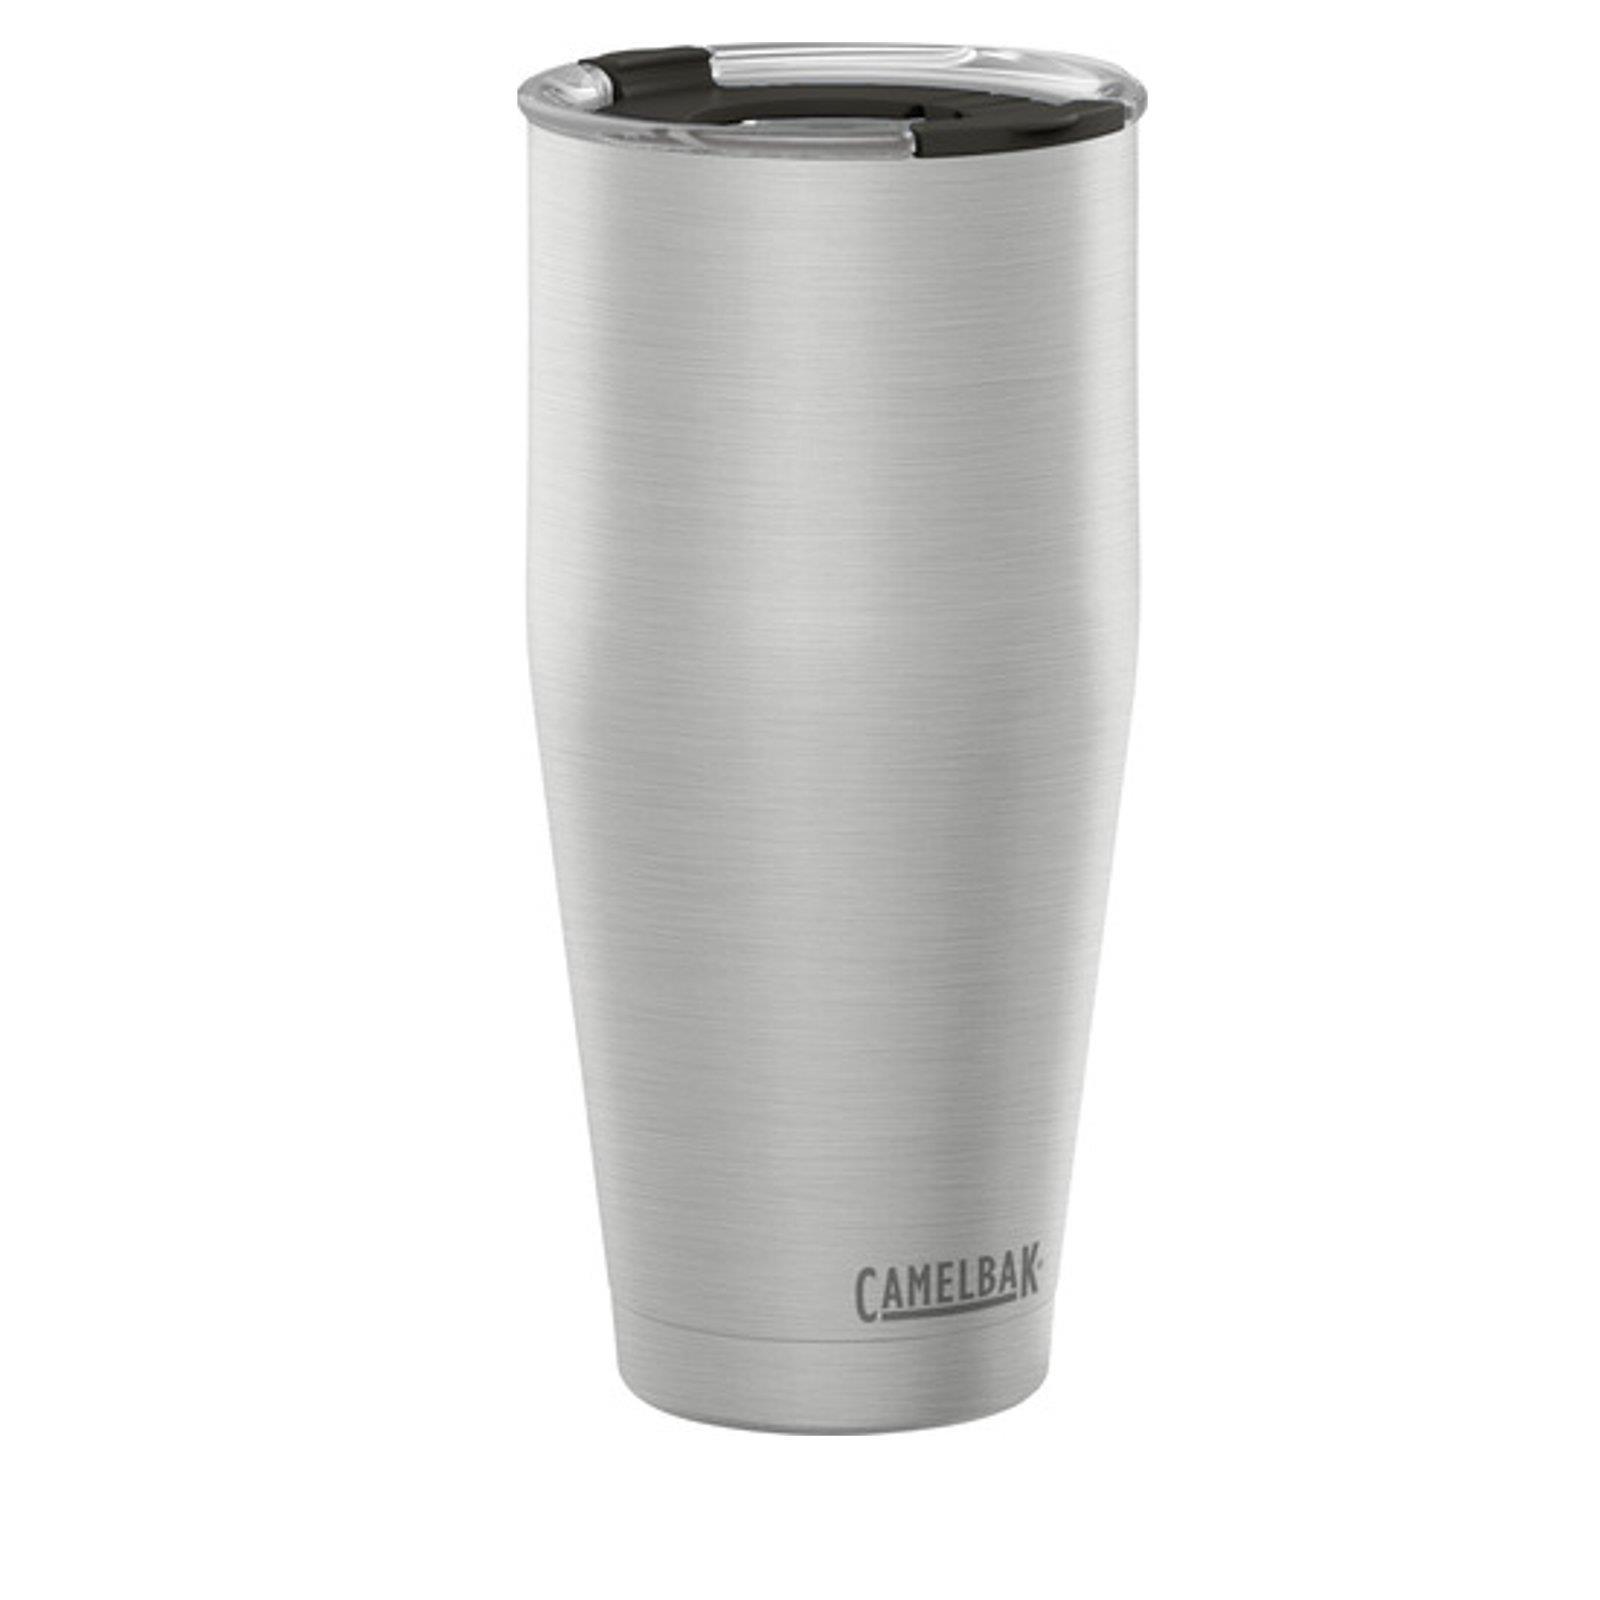 Camelbak-Kickbak-Edelstahl-Thermo-Trink-Auto-Becher-600ml-900ml-Isoliert-Kaffee Indexbild 3